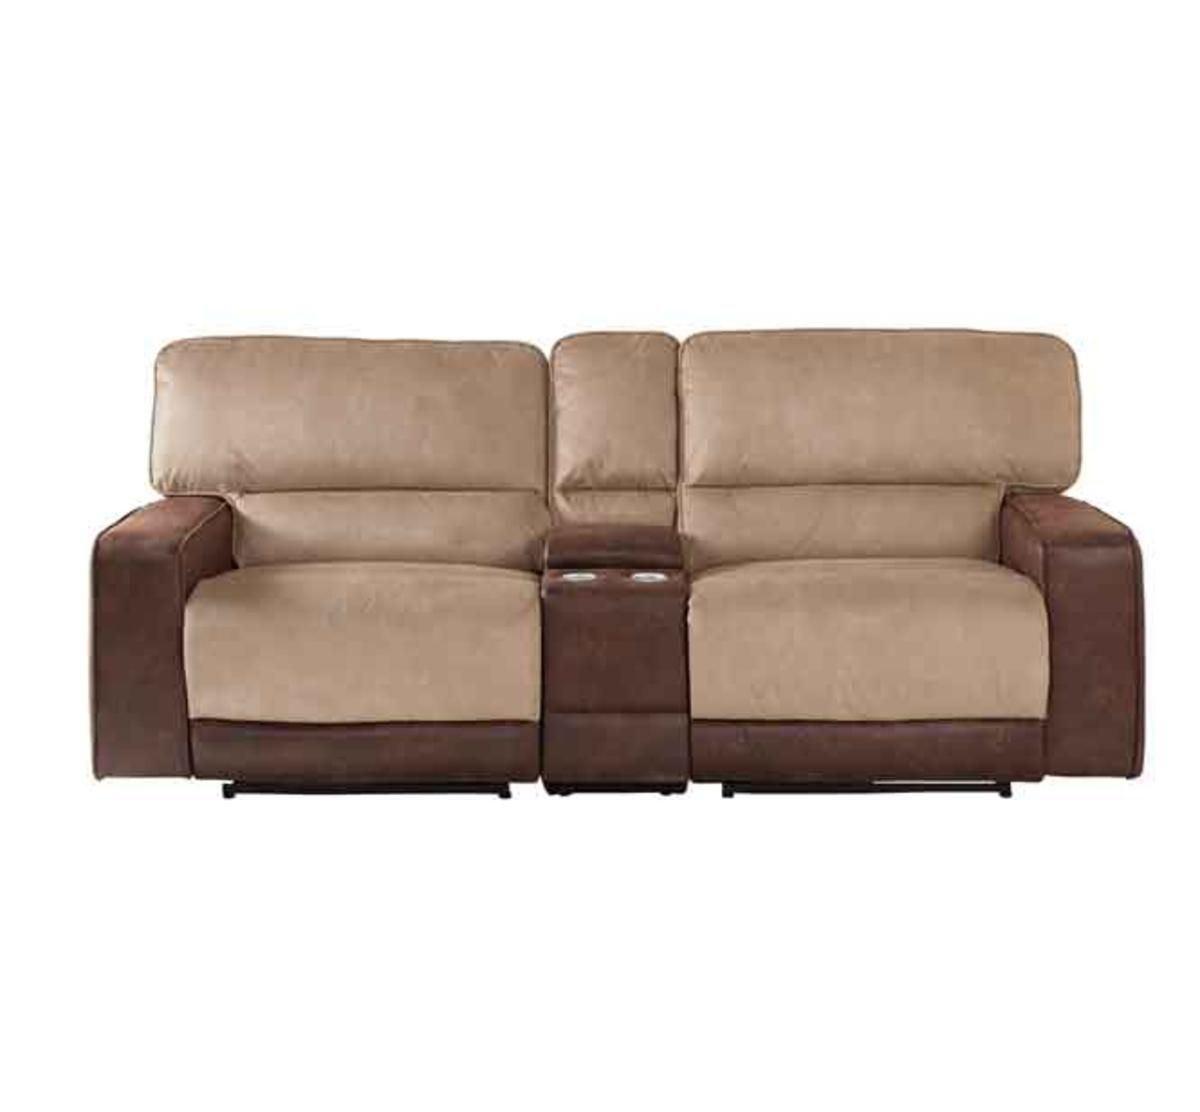 Pasadena 3 Pc Console Sofa